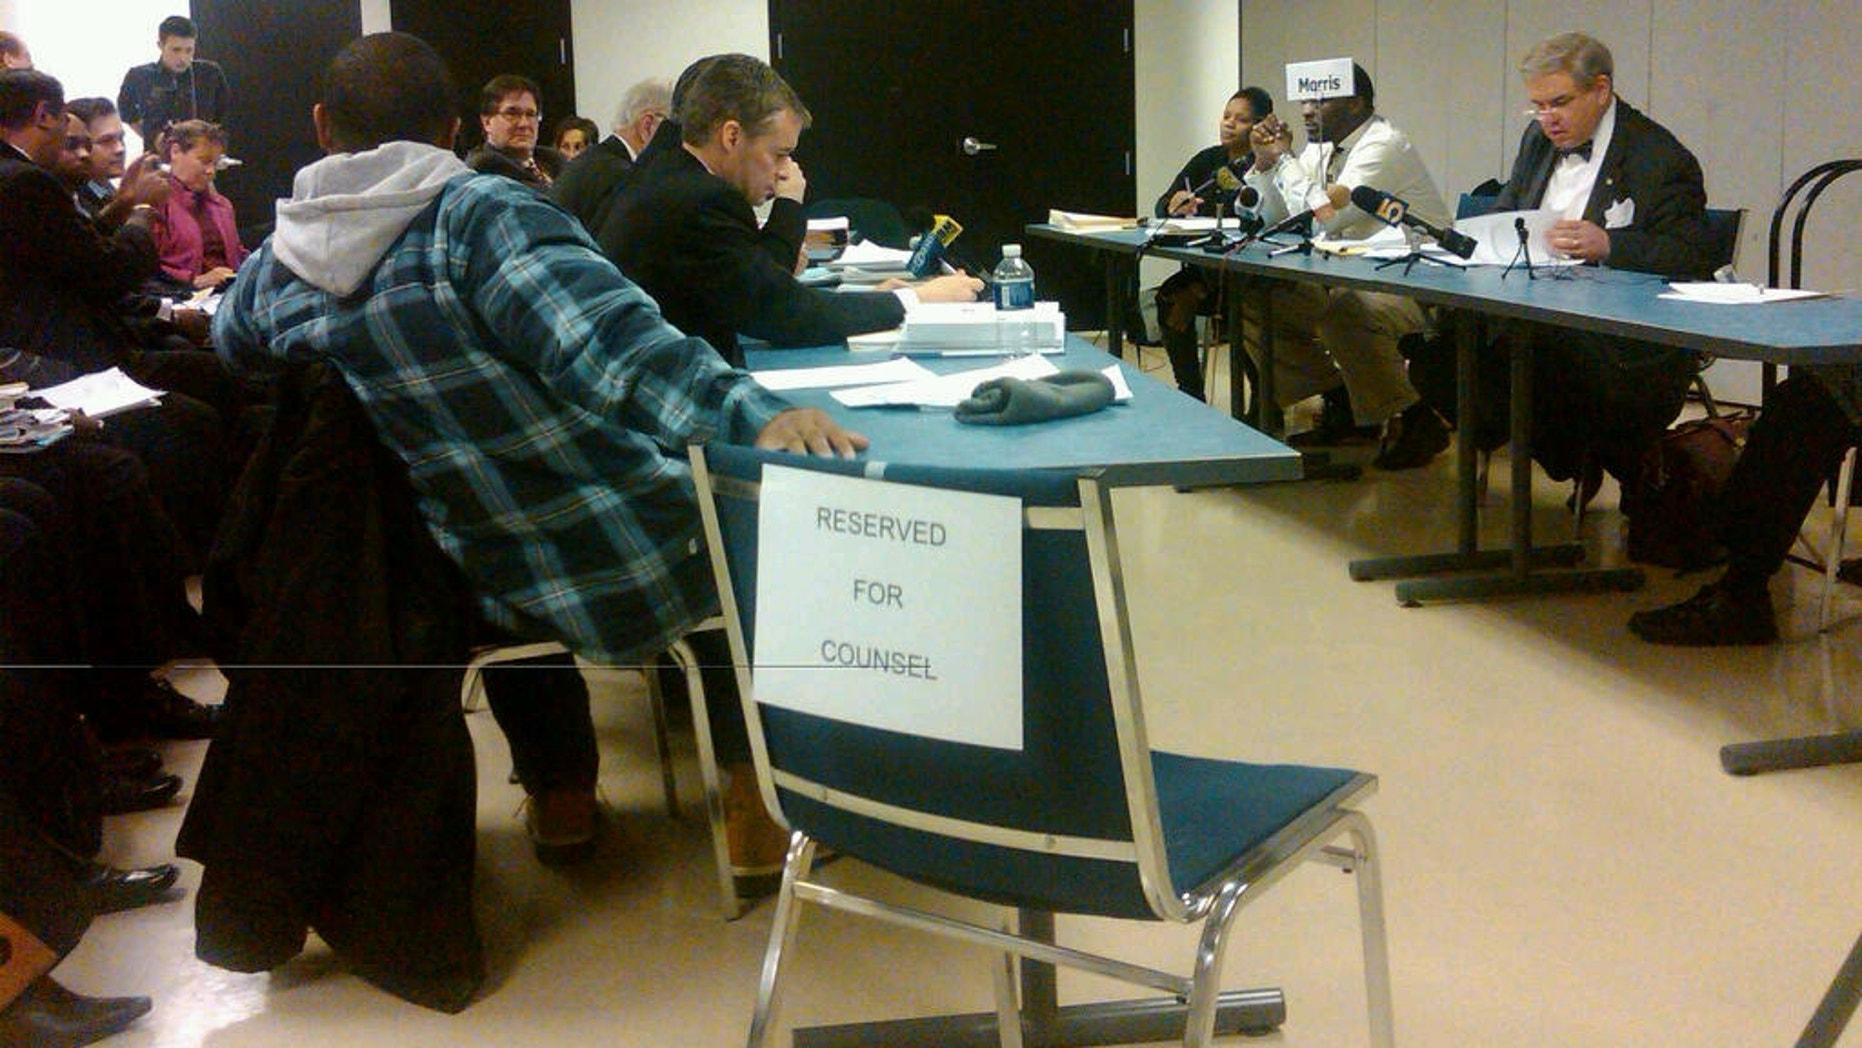 Friday's Chicago Board of Election Hearing (Fox News Photo / Marla Cichowski)